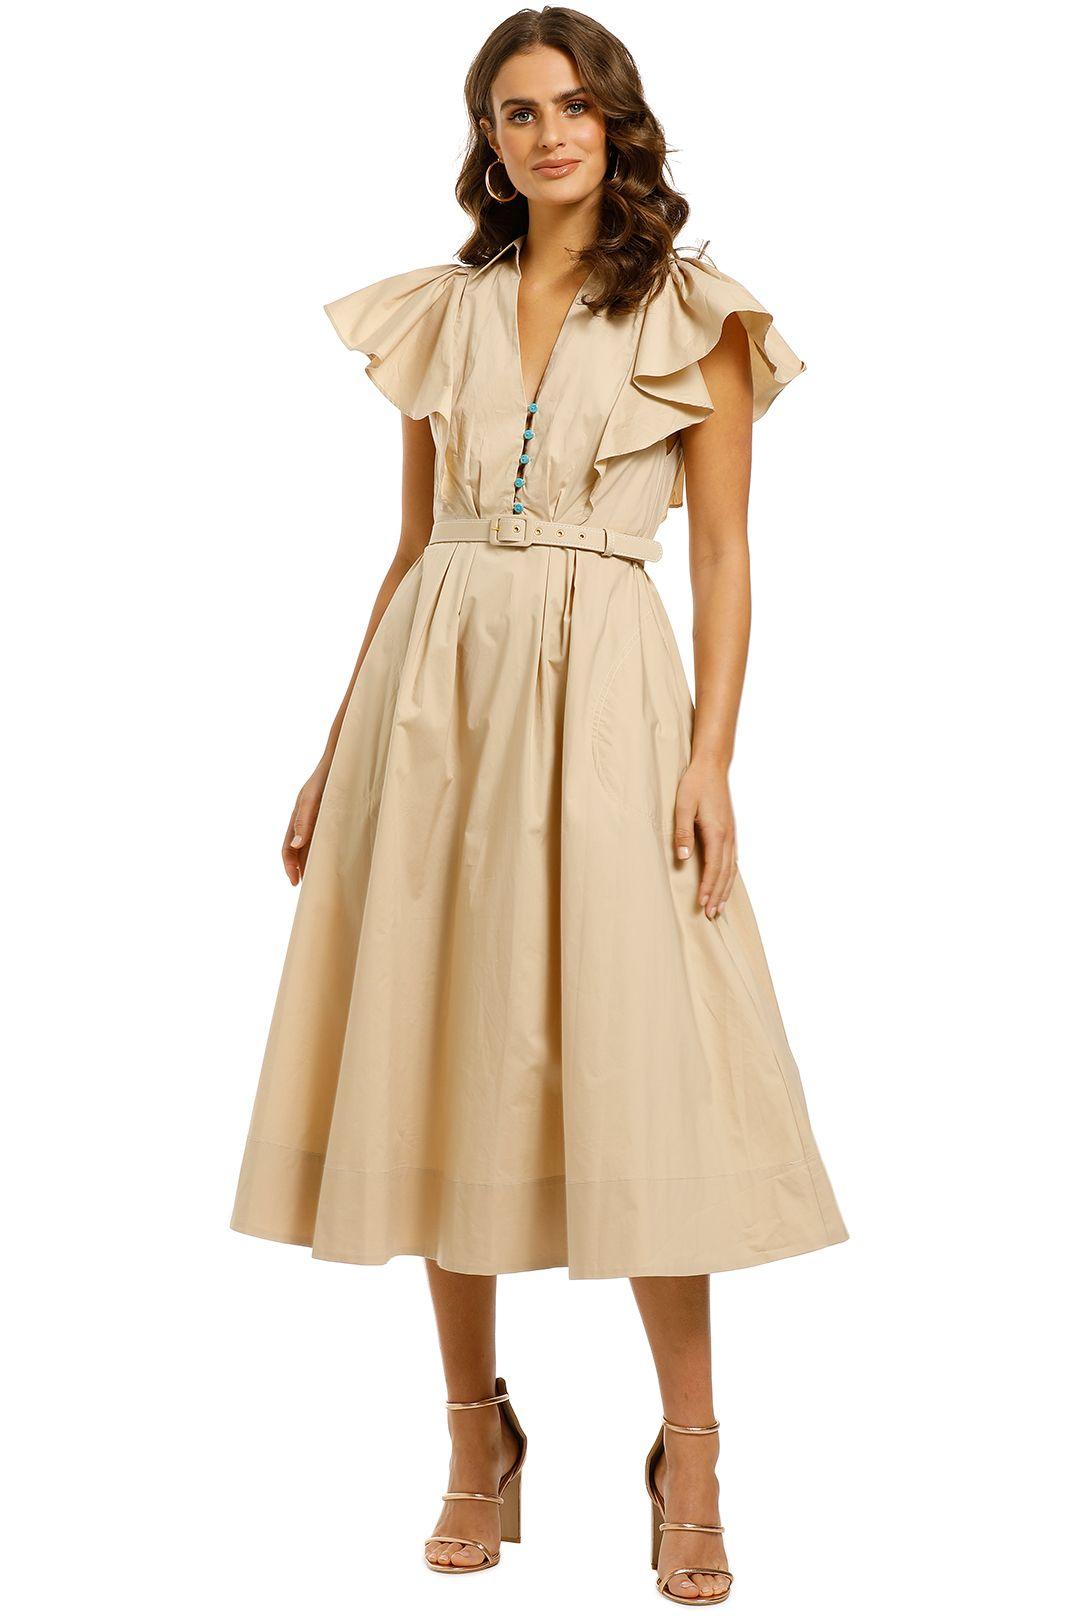 Nicholas-Sandra-Dress-Adobe-Front